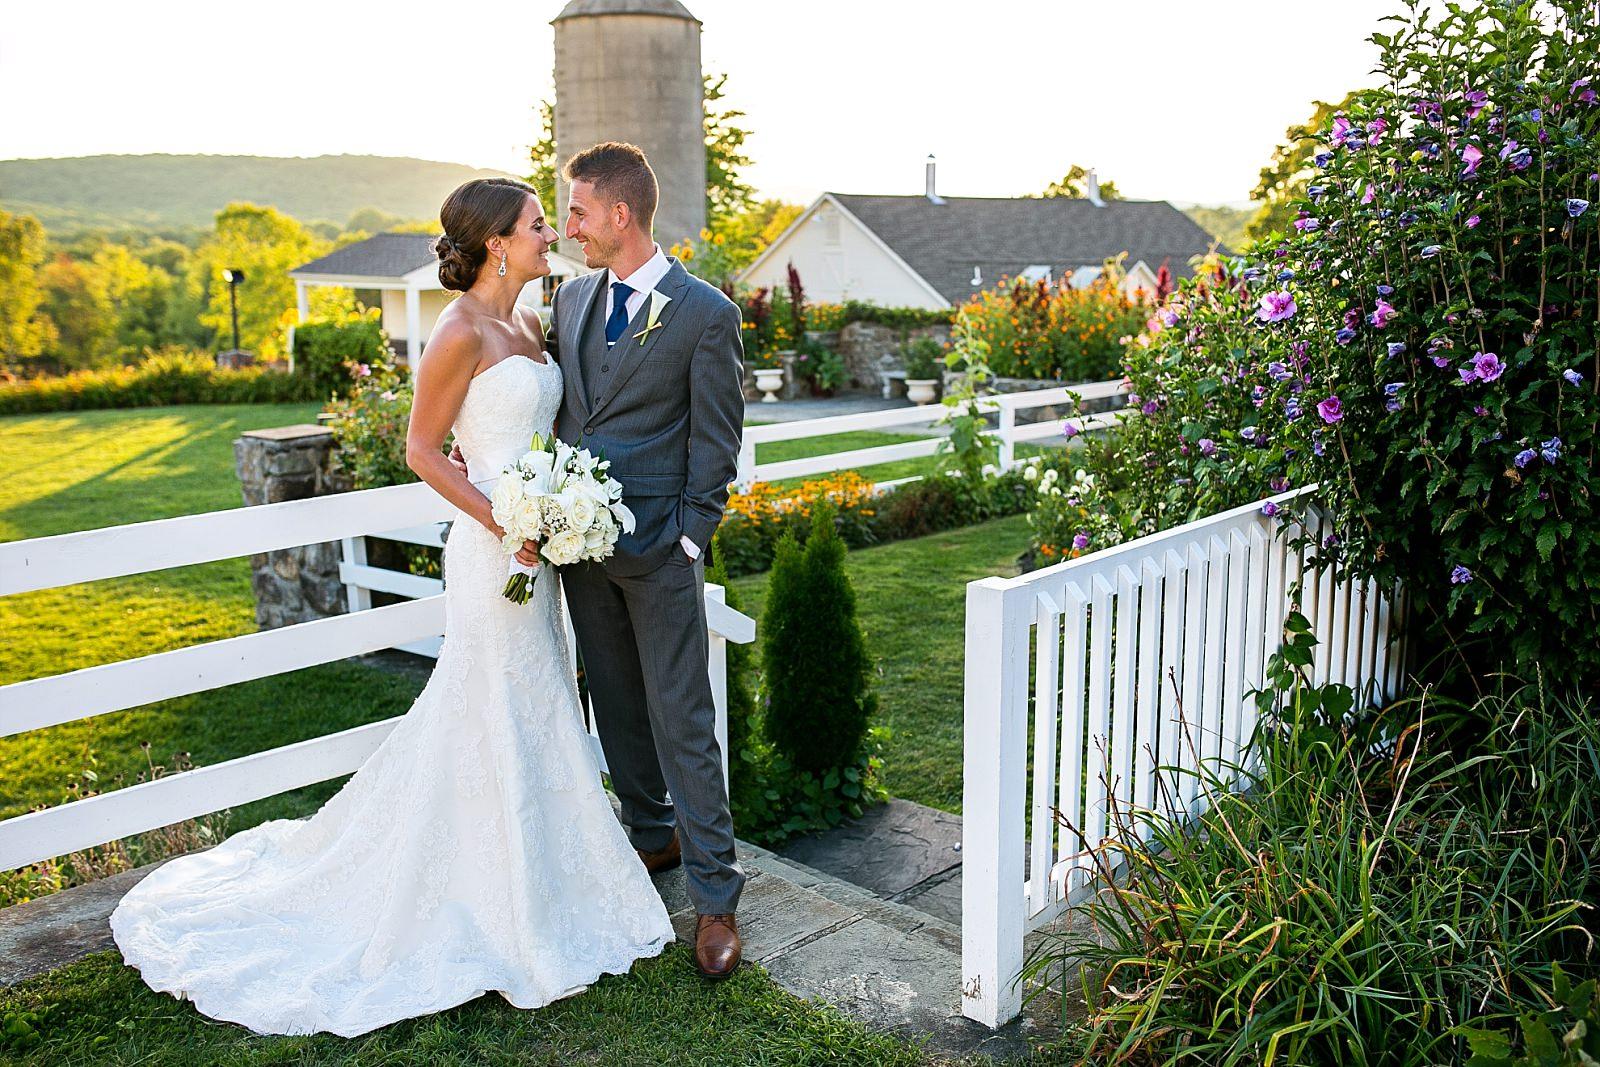 CT_Wedding_Photographer_LiNa_Wed_56.jpg